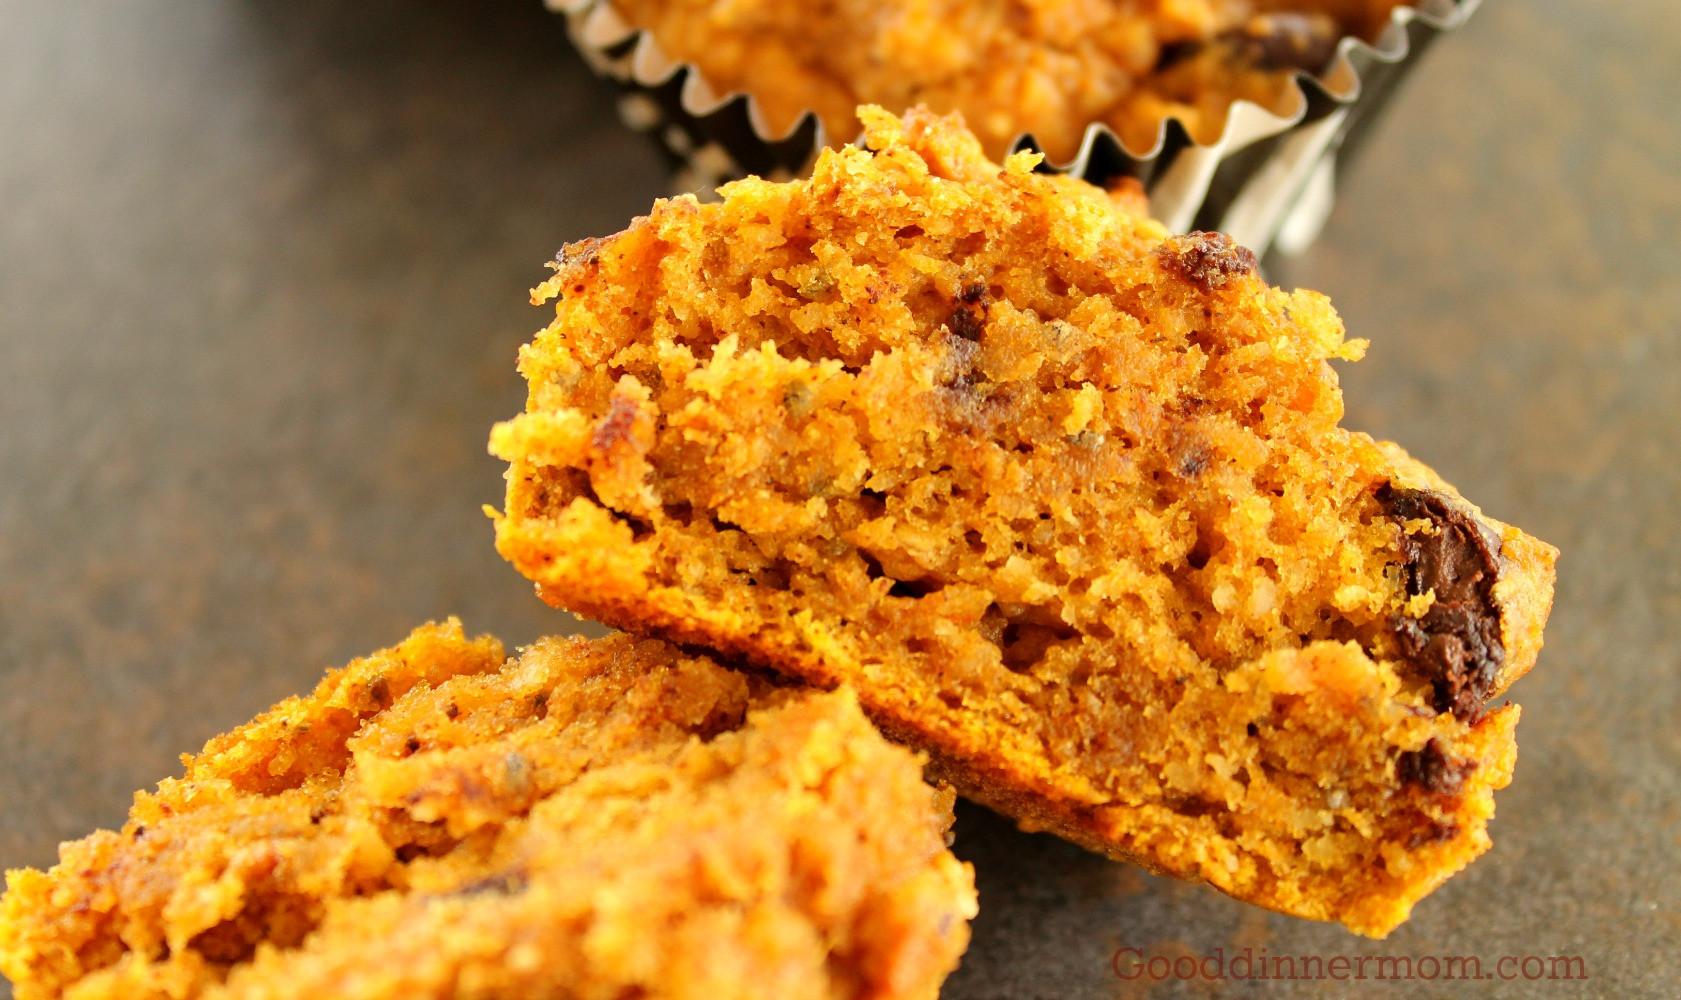 Healthy Pumpkin Chocolate Chip Muffins  Good Dinner Mom